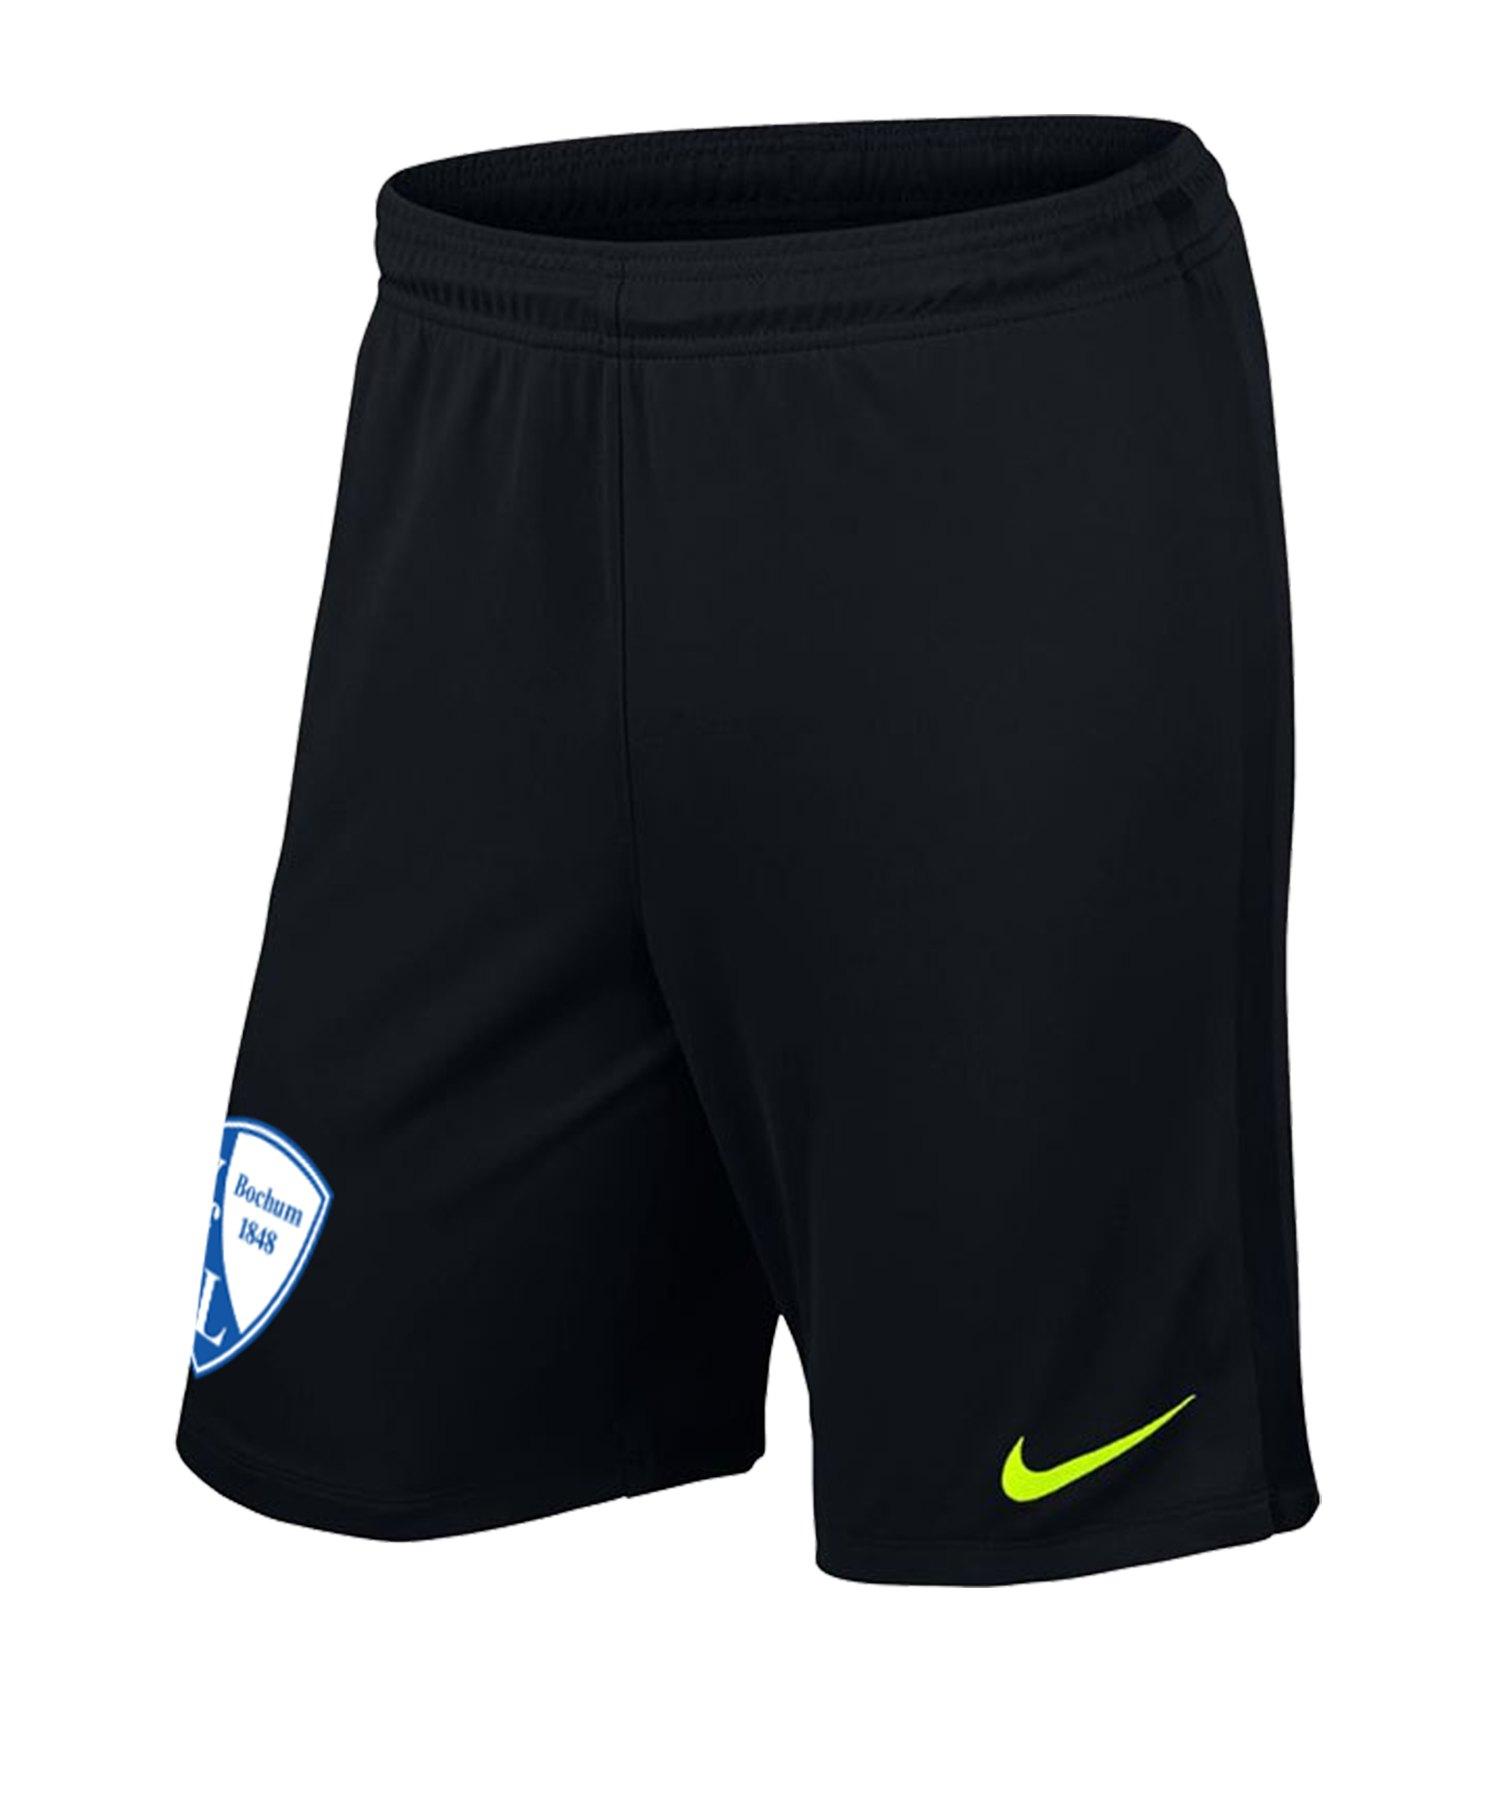 Nike VfL Bochum Torwartshort 2019/2020 F011 - schwarz